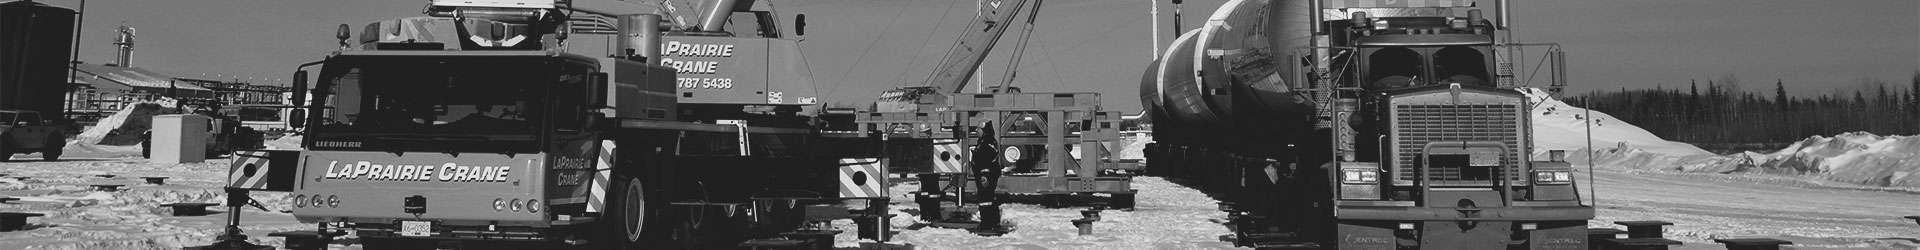 Winnipeg crane service company